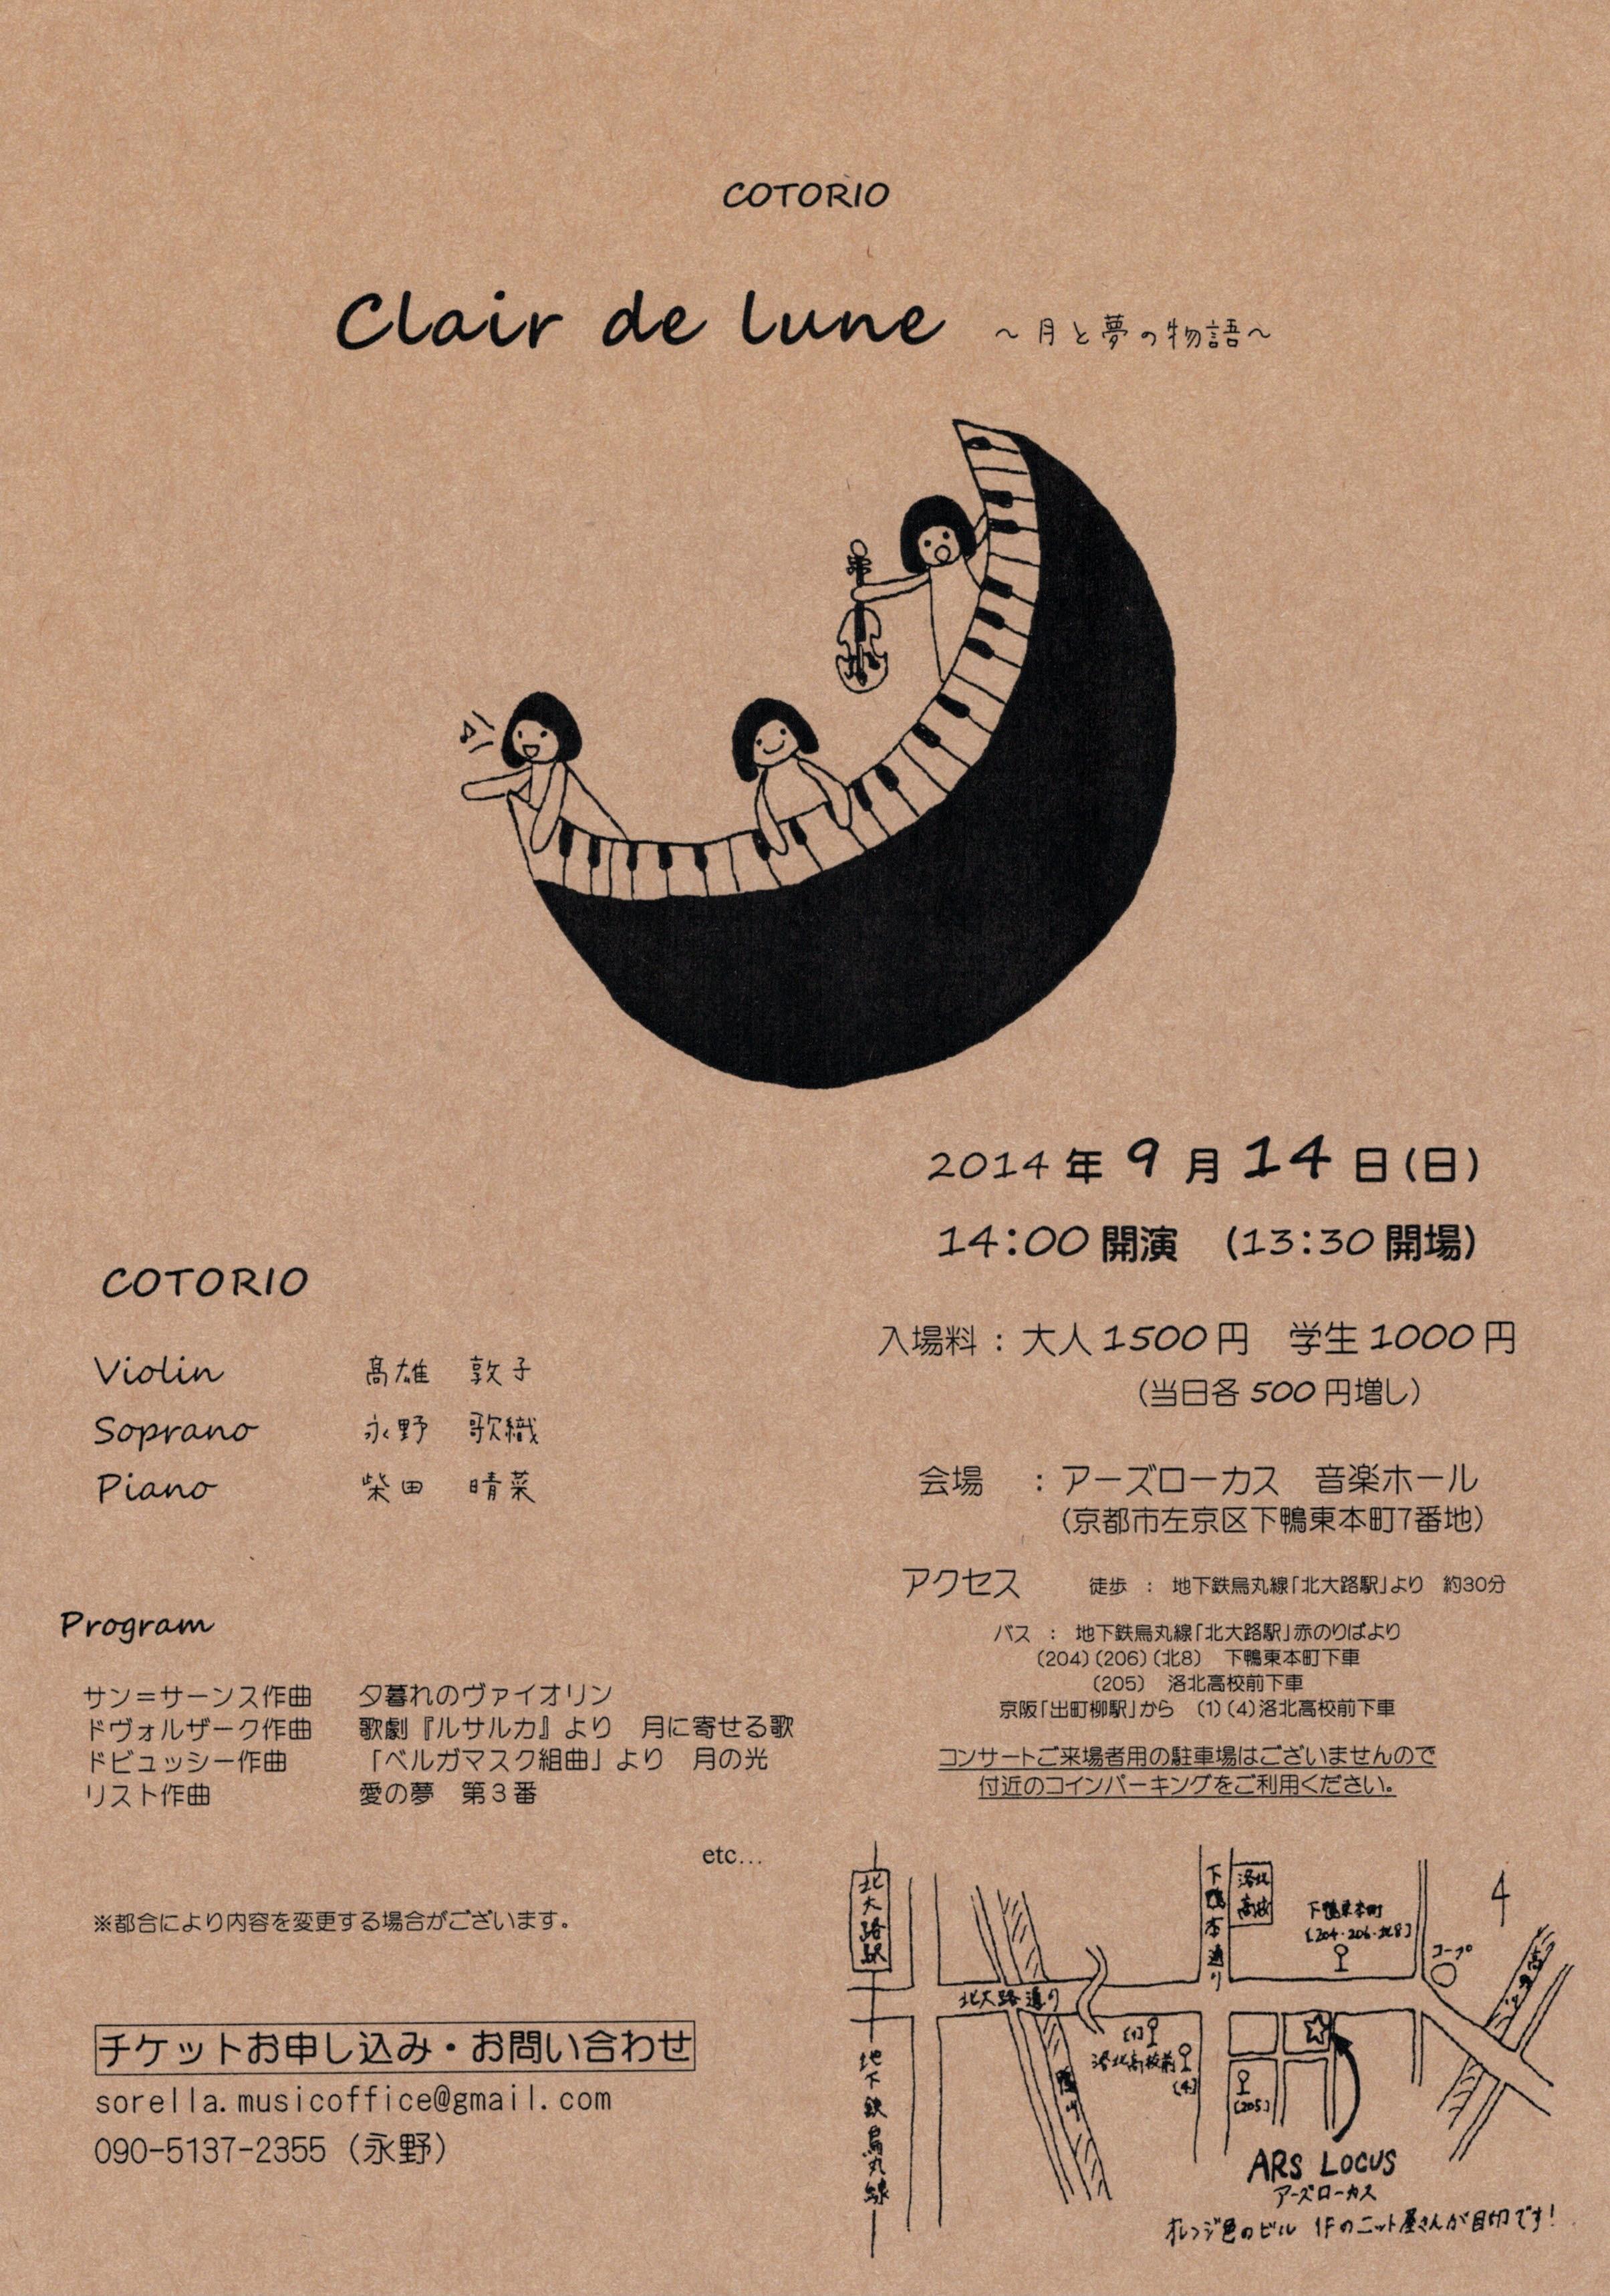 Clair de lune ~月と夢の物語~